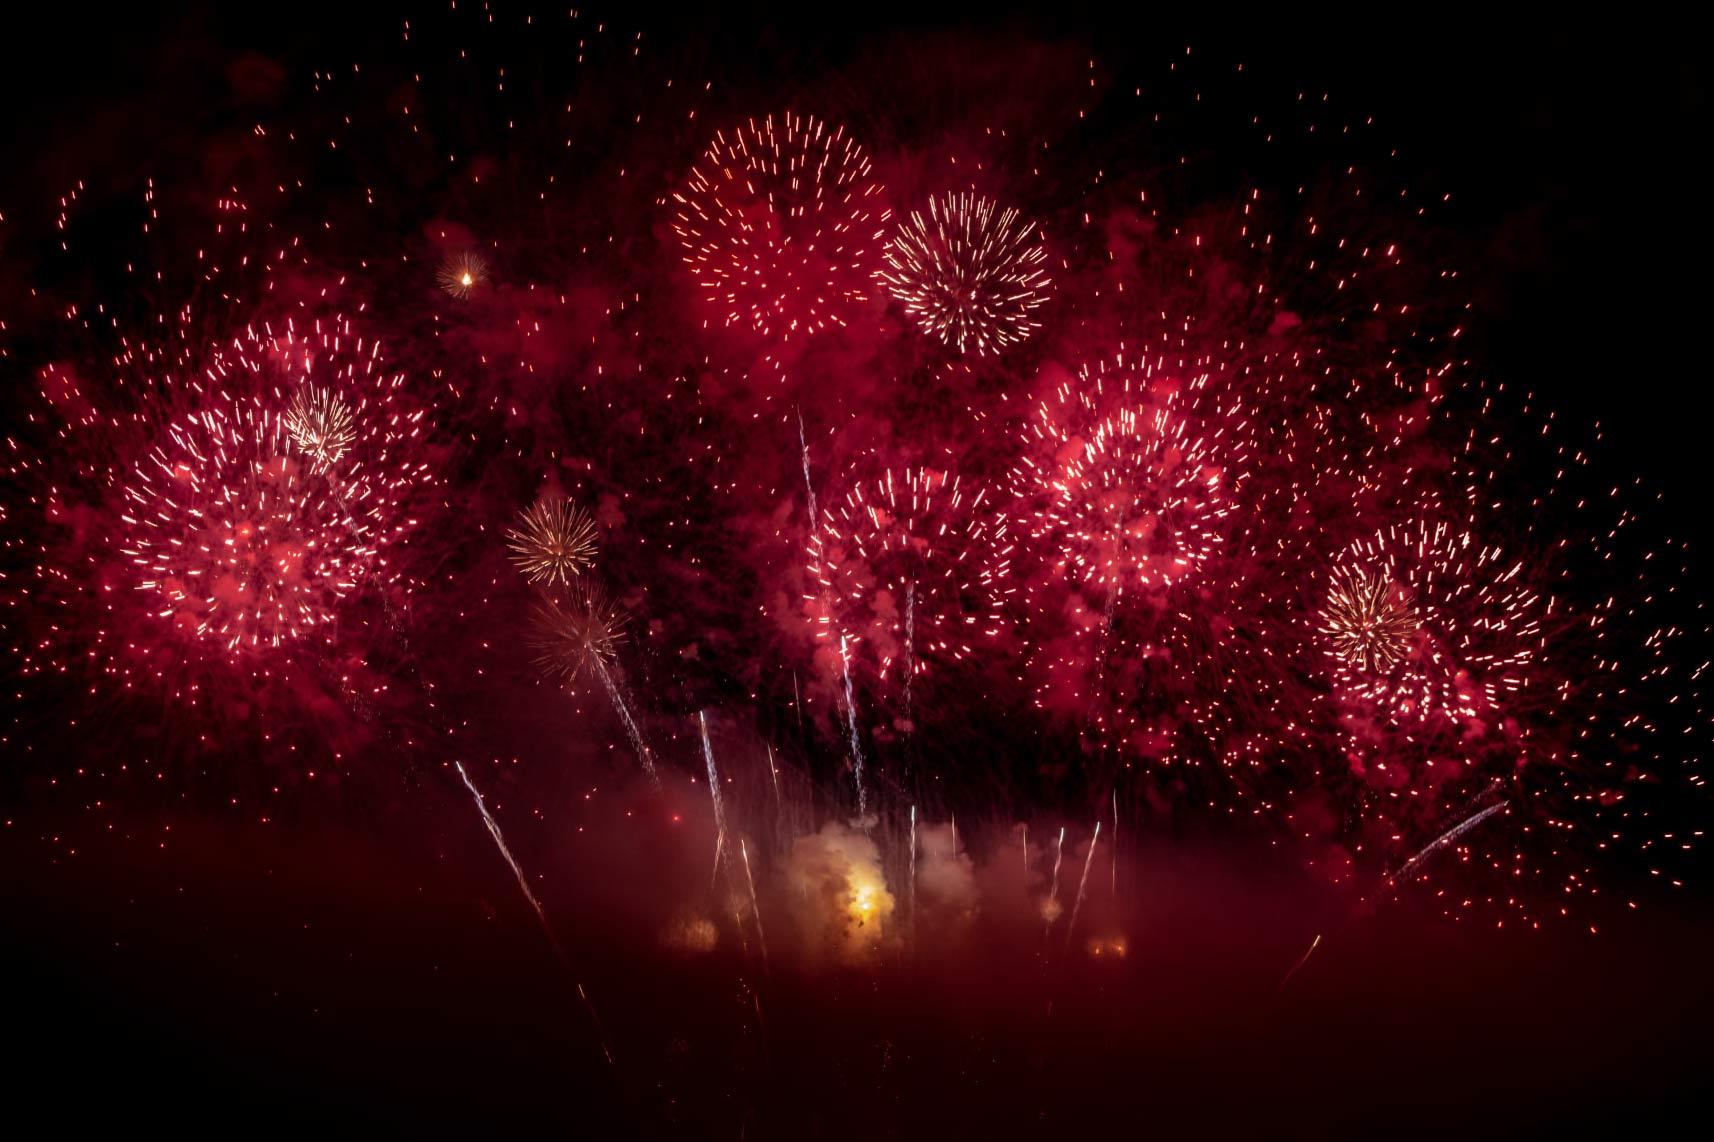 Fireworks-1*-2019